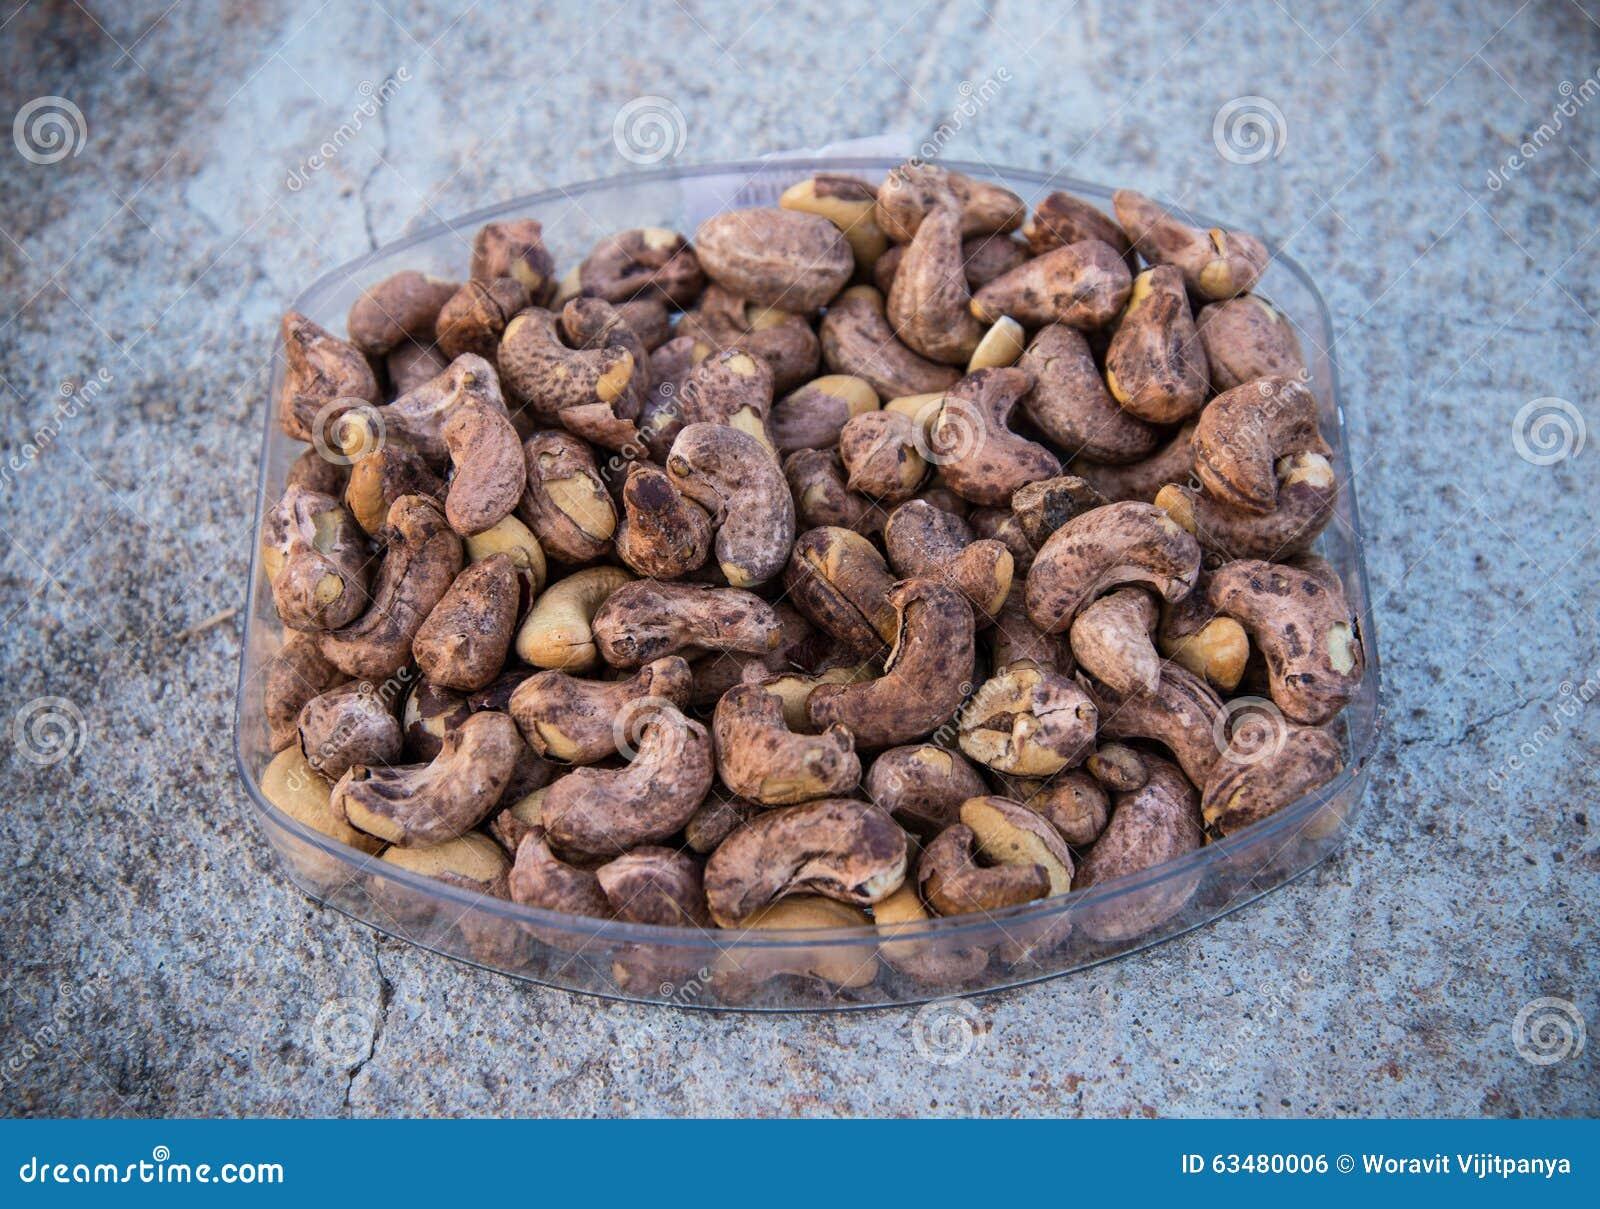 Nut Group 4